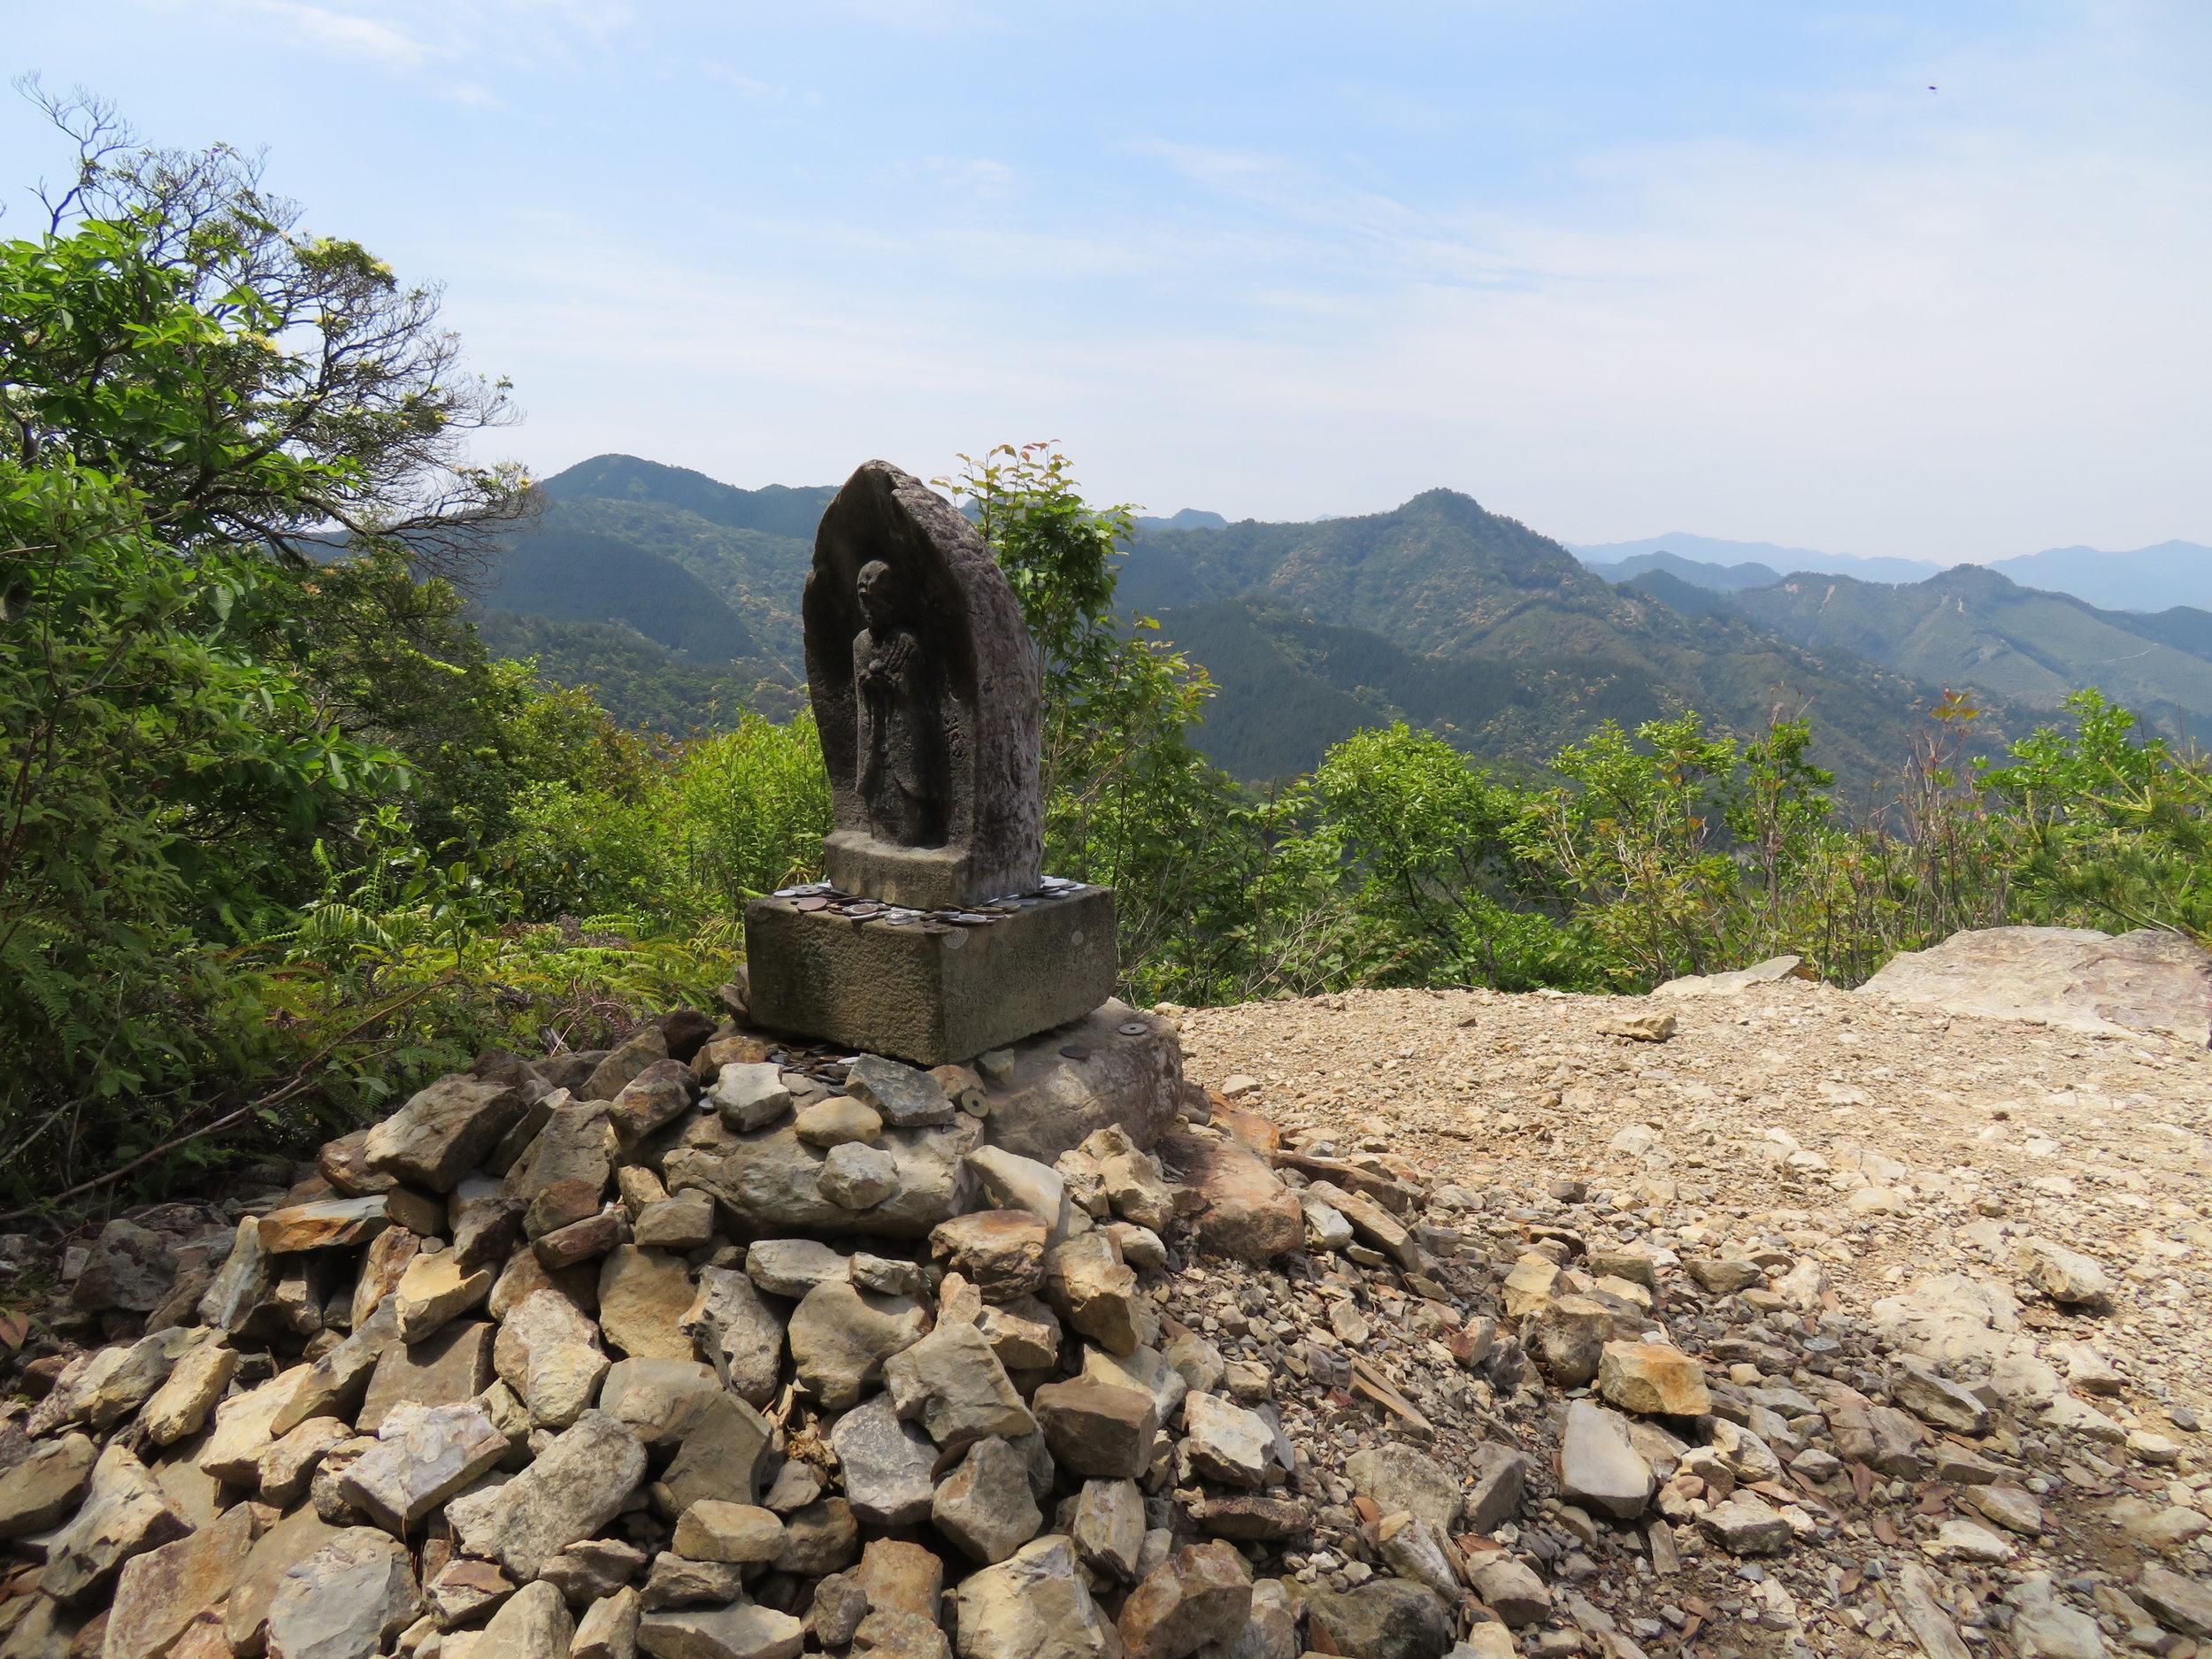 Great views of the Kii Peninsula